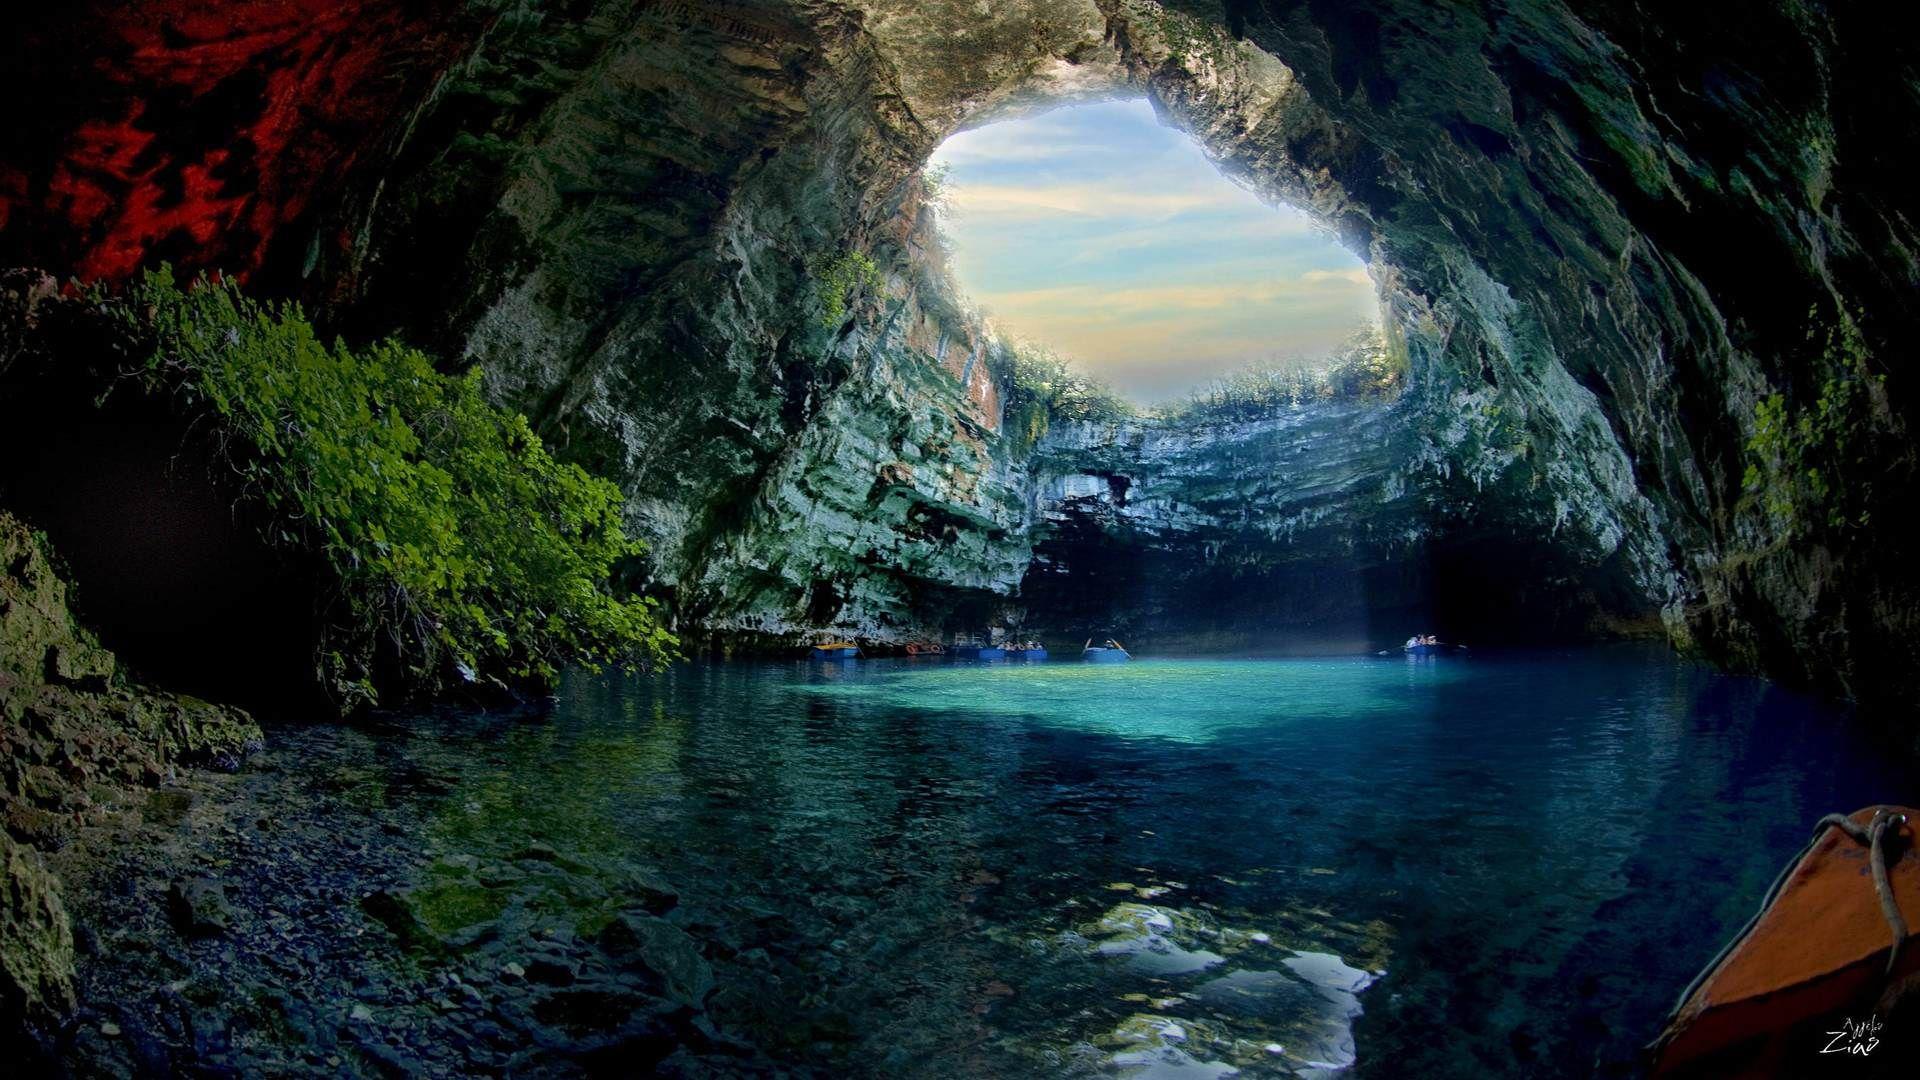 Cave Lake Melissani